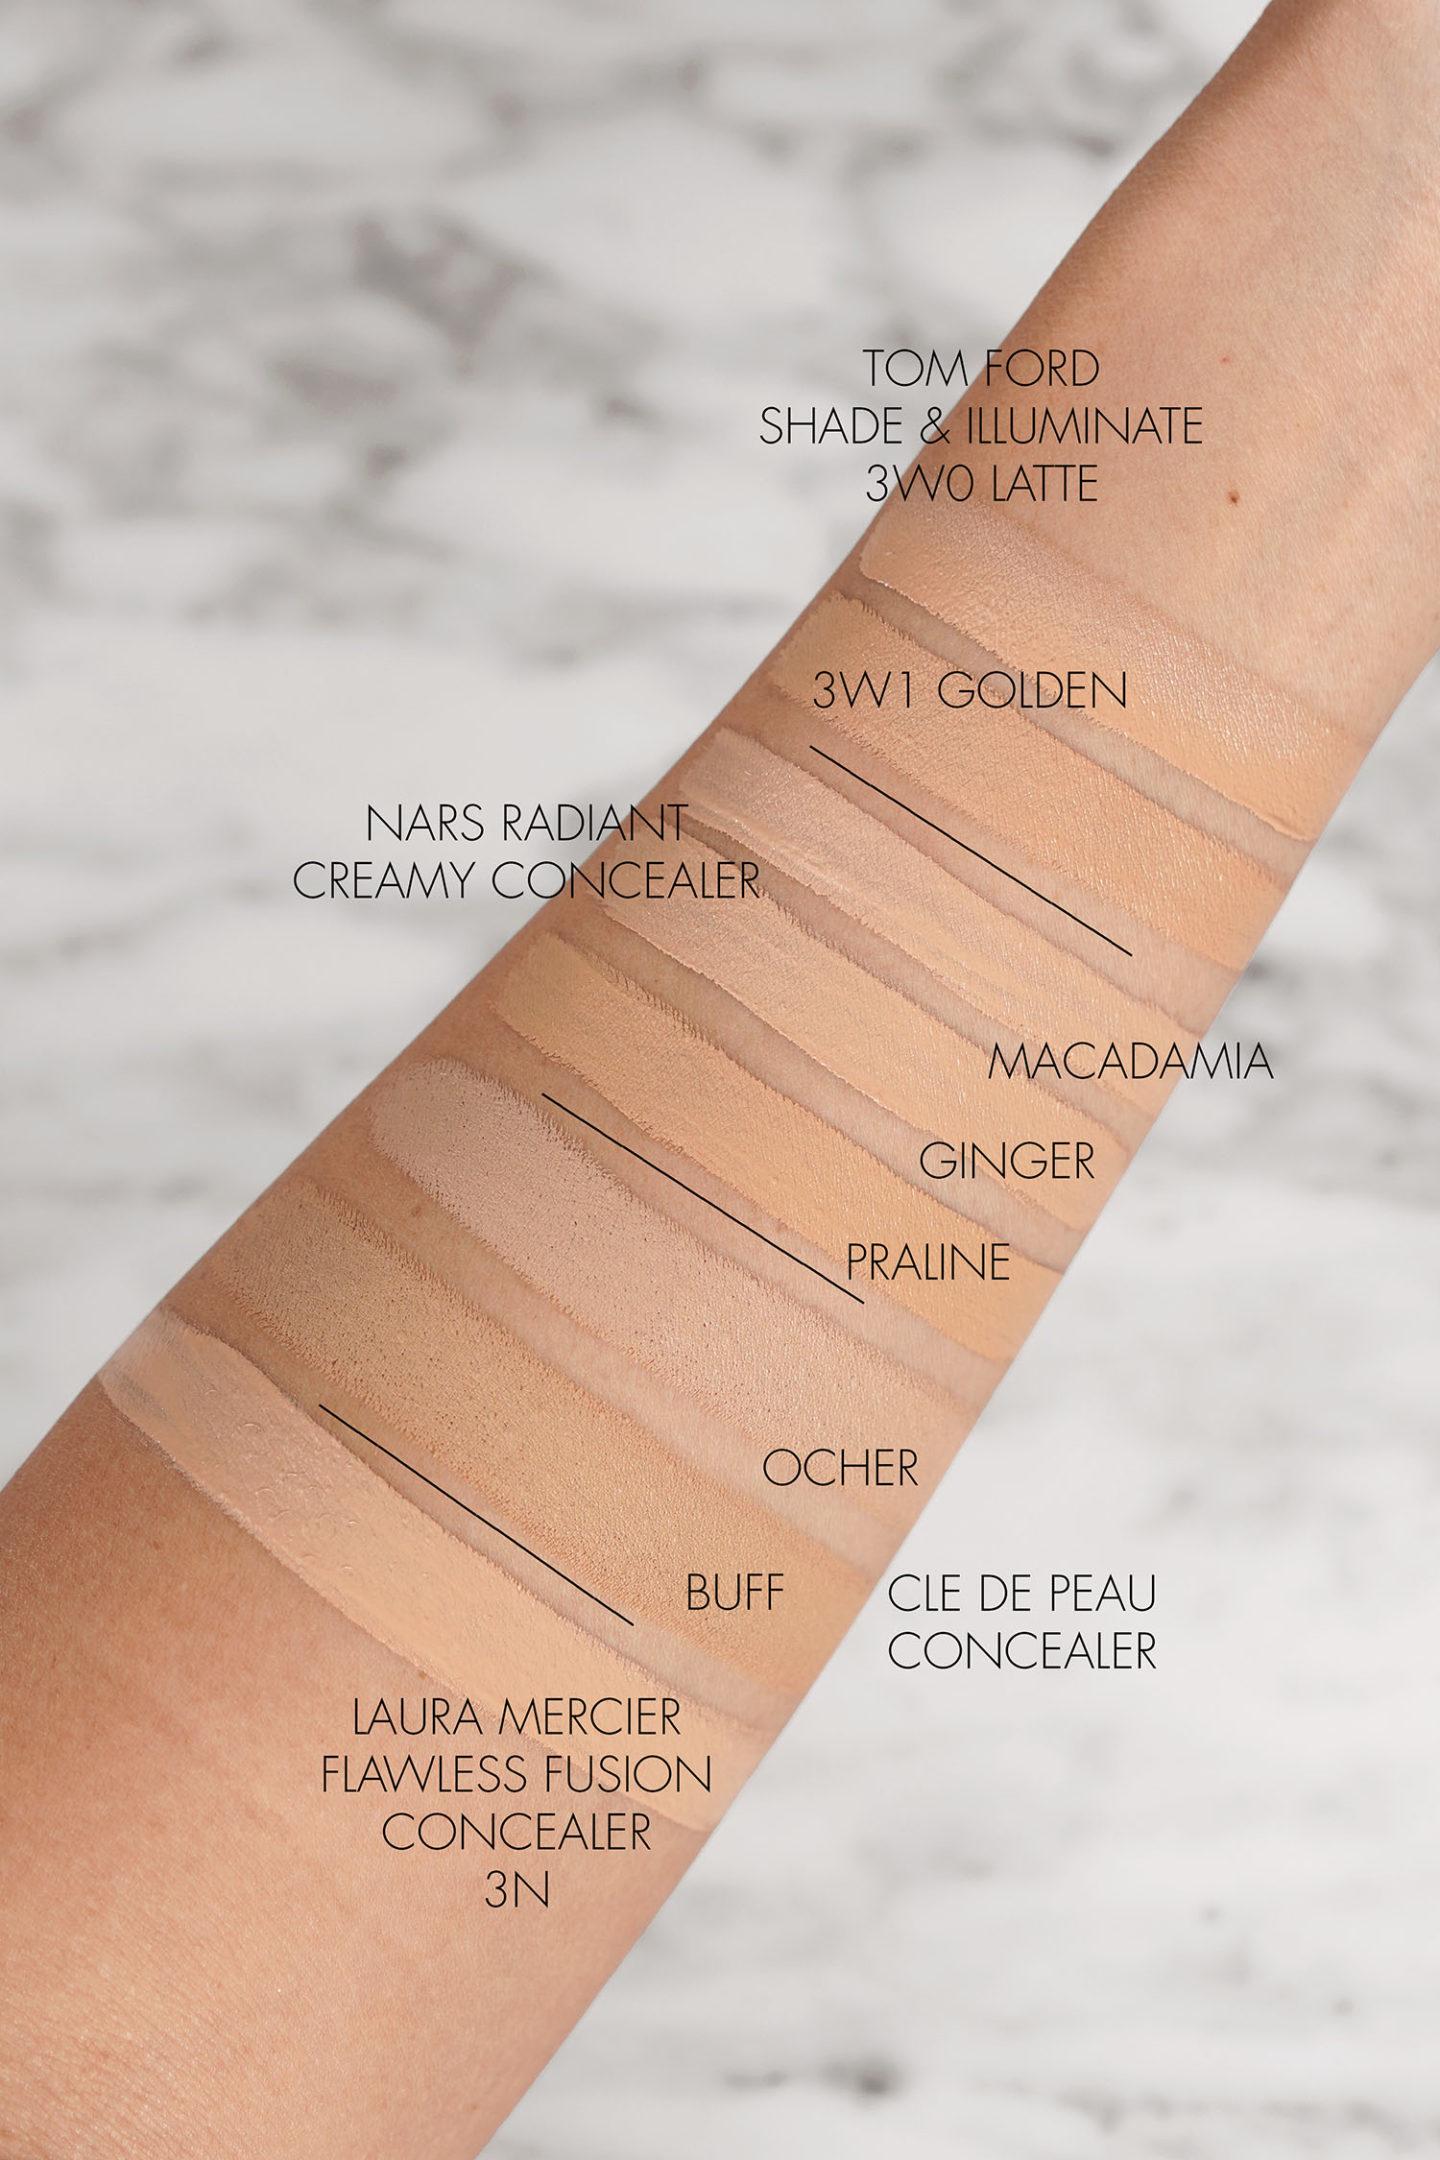 Tom Ford Shade Illuminate Concealer vs NARS Radiant Creamy Concealer, Cle de Peau Concealer et Laura Mercier Flawless Fusion